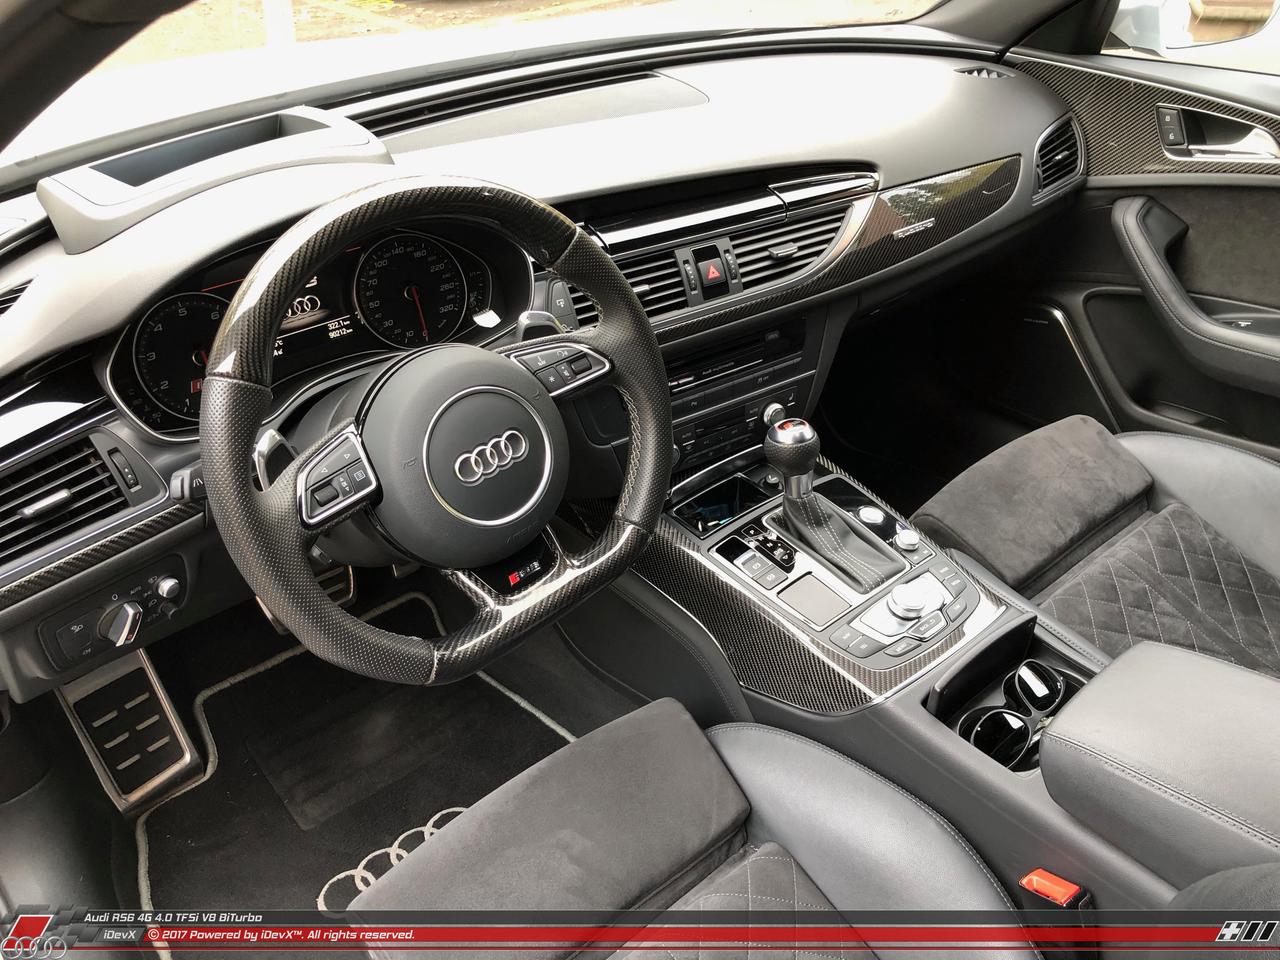 10_11.2018_Audi-RS6_iDevX_014.png